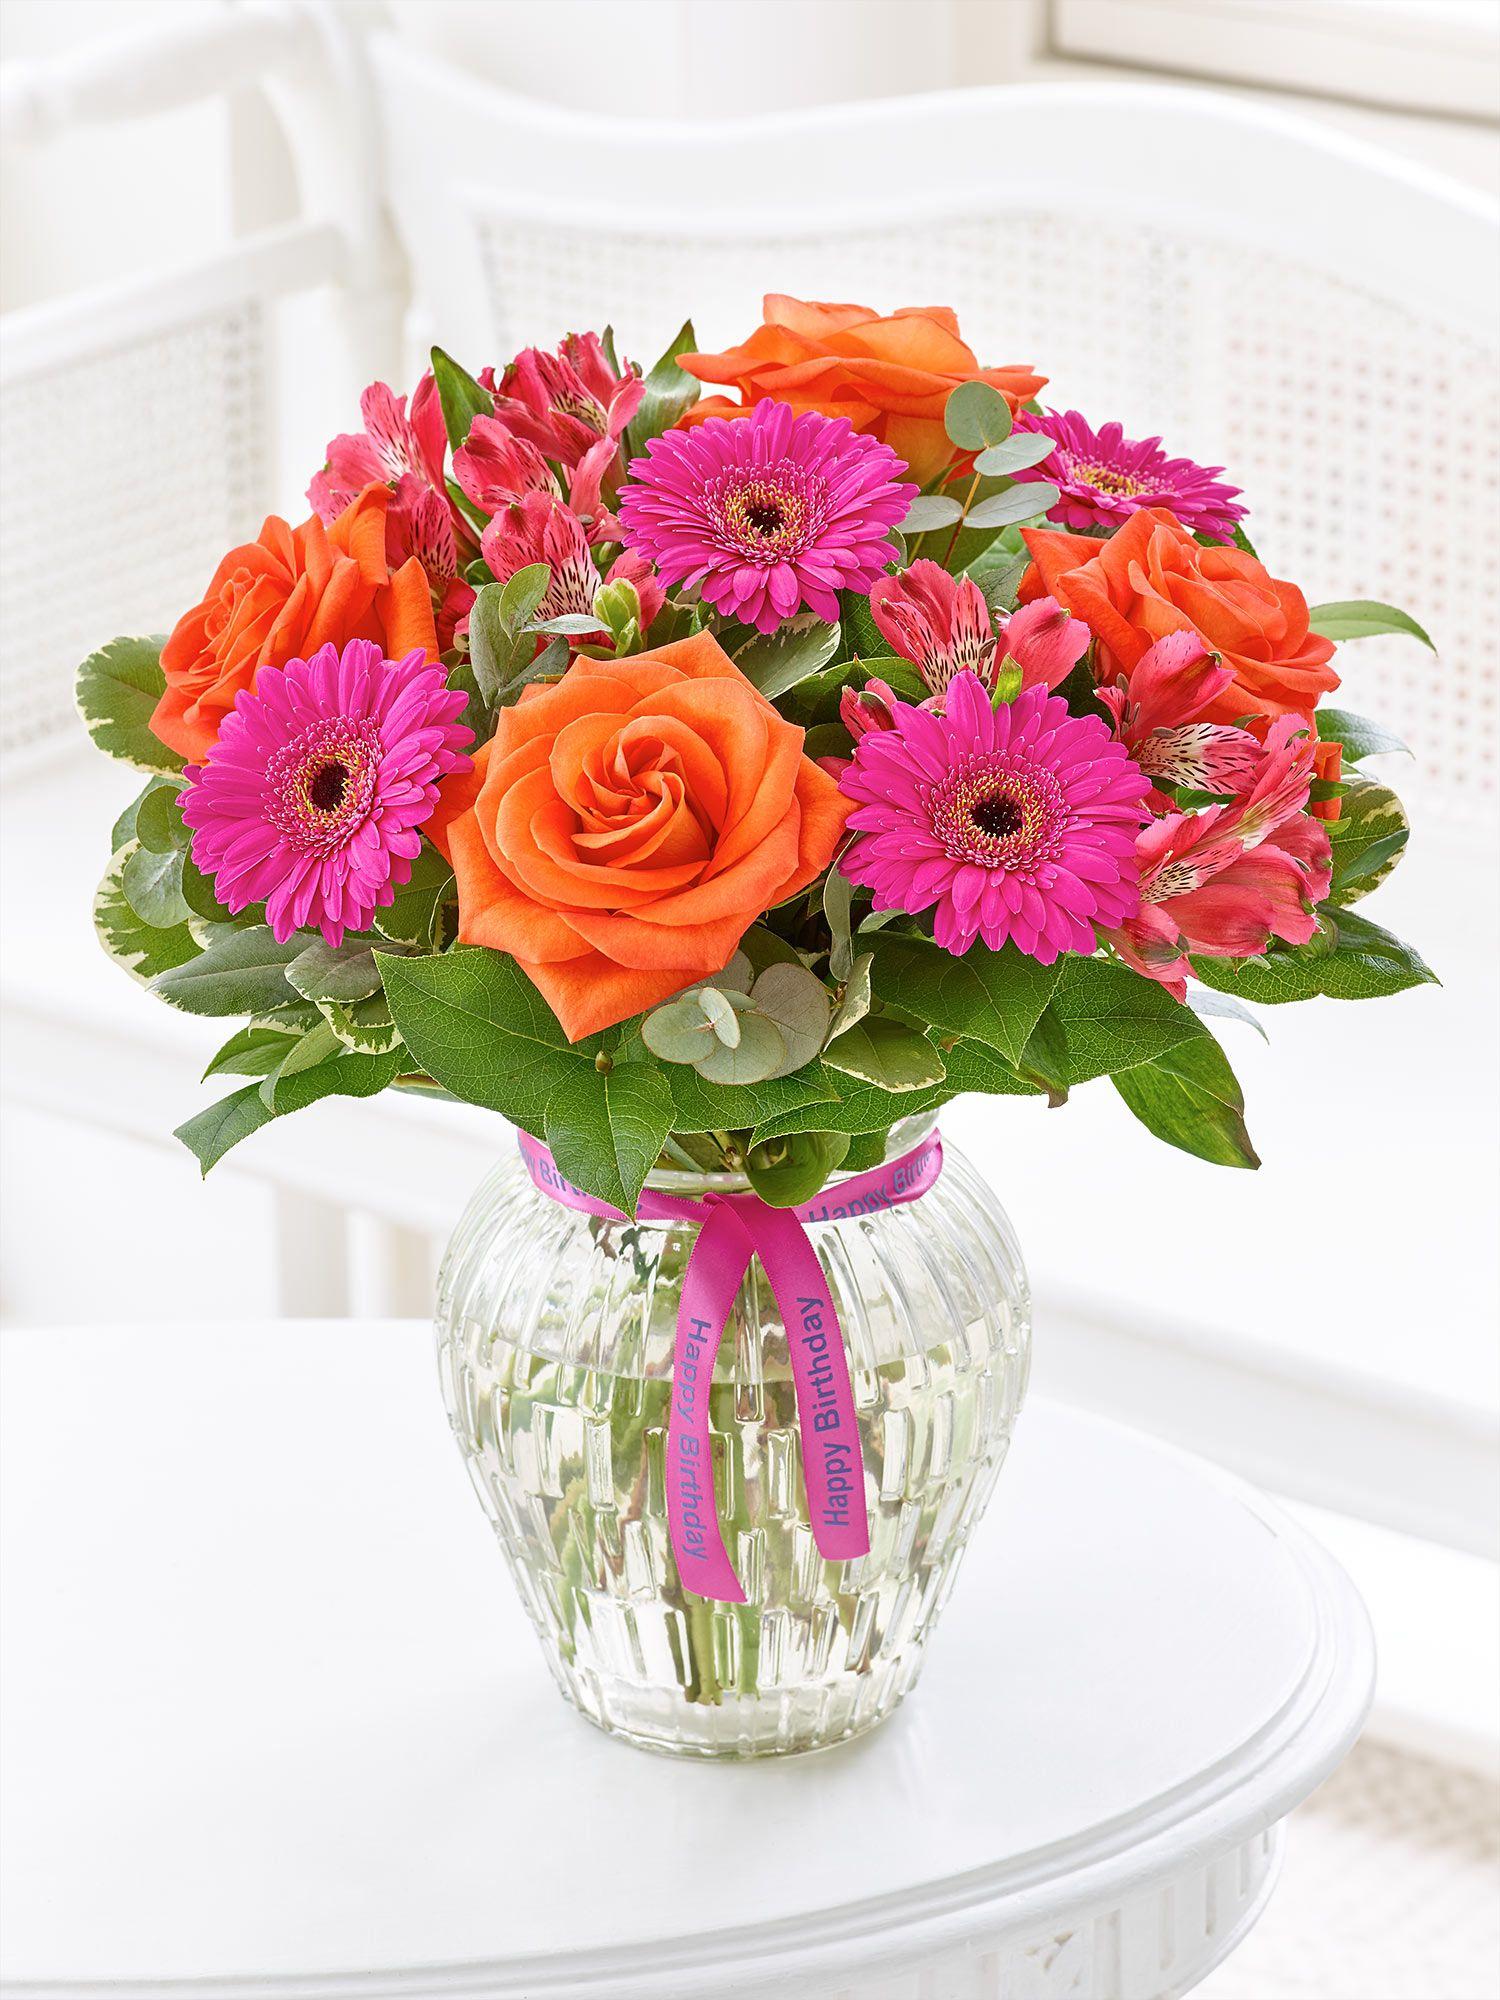 Happy birthday vibrant vase buenos deseos pinterest flowers happy birthday vibrant vase izmirmasajfo